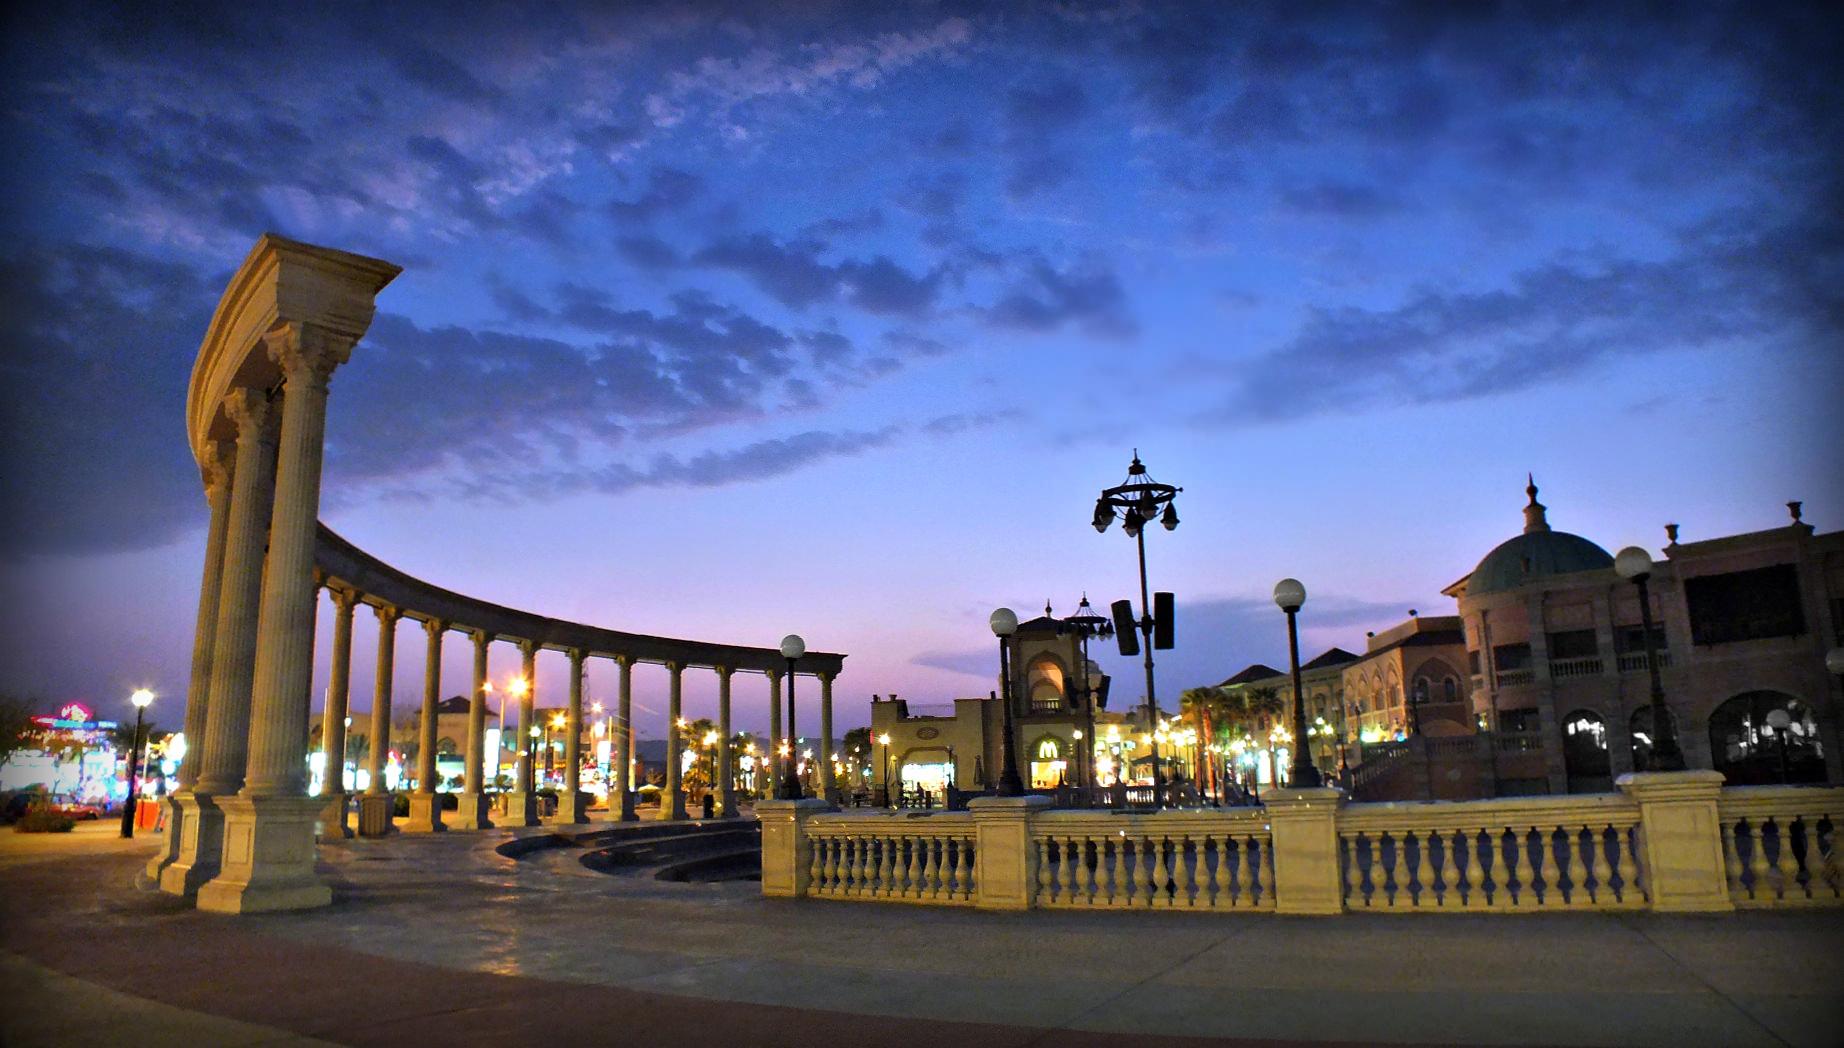 il Mercato, Шарм-эль-Шейх. Фото: Daniel Lee / flickr.com